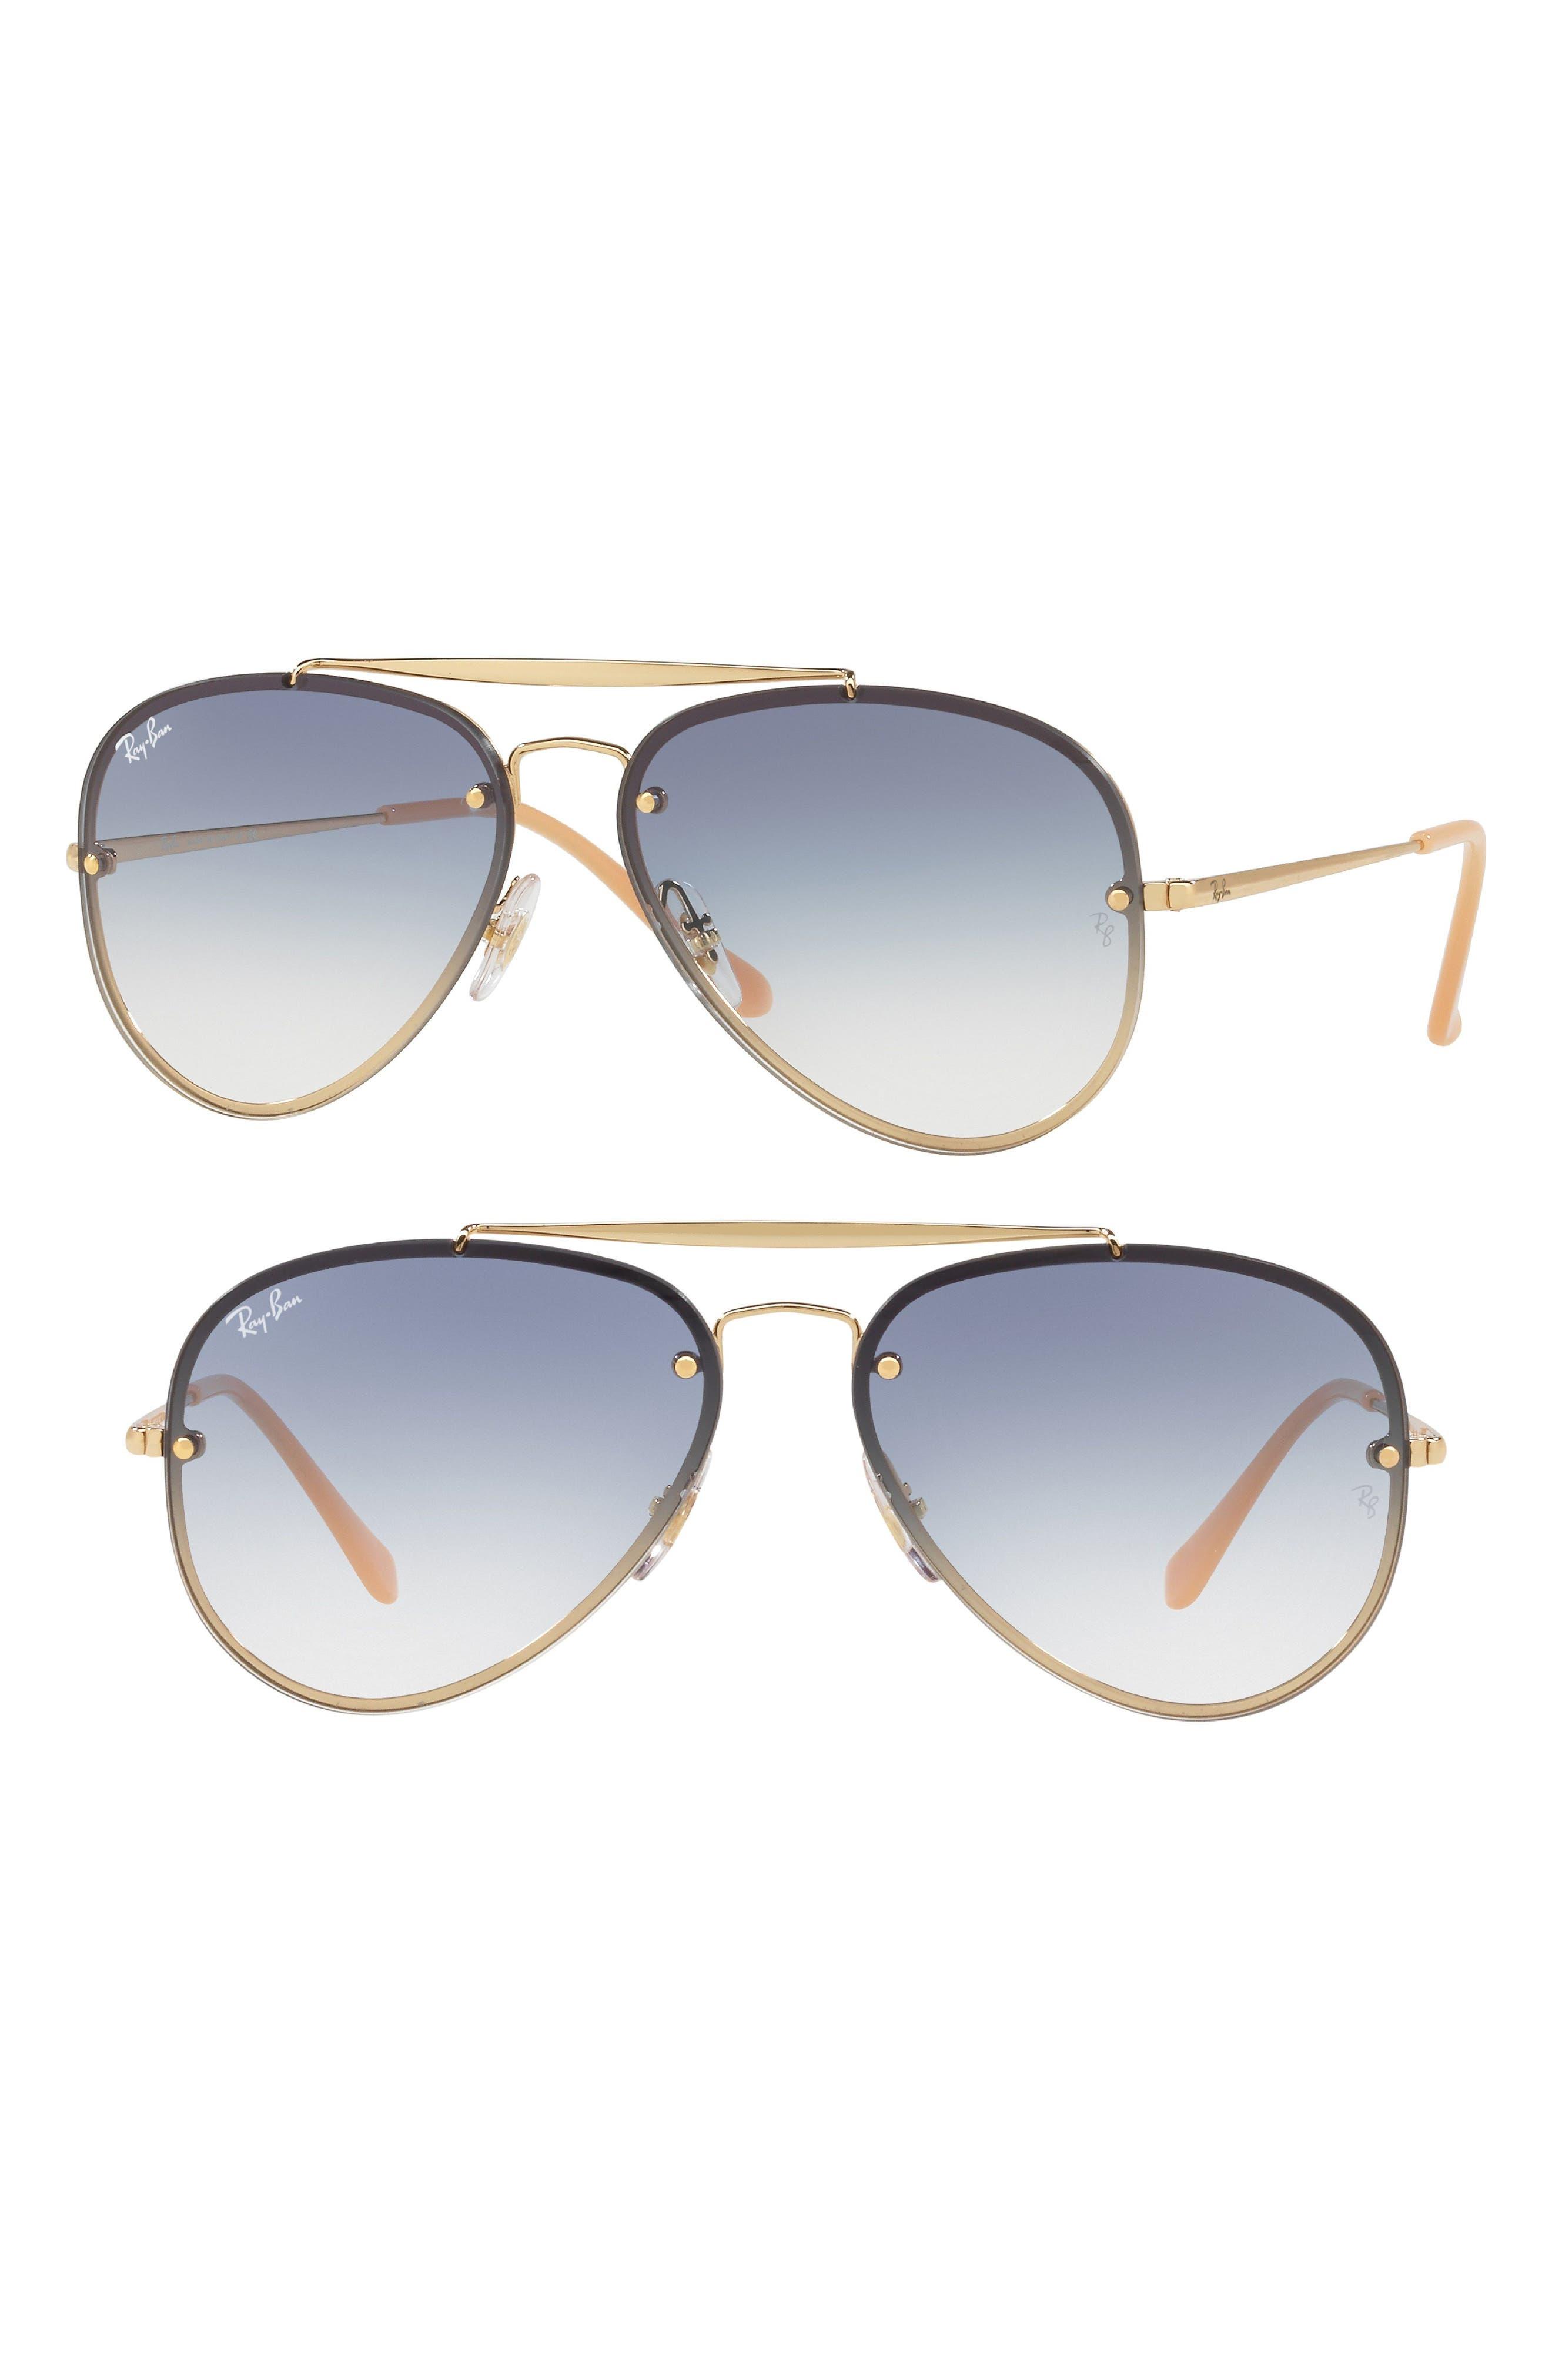 61mm Gradient Lens Aviator Sunglasses,                         Main,                         color, Gold Blue